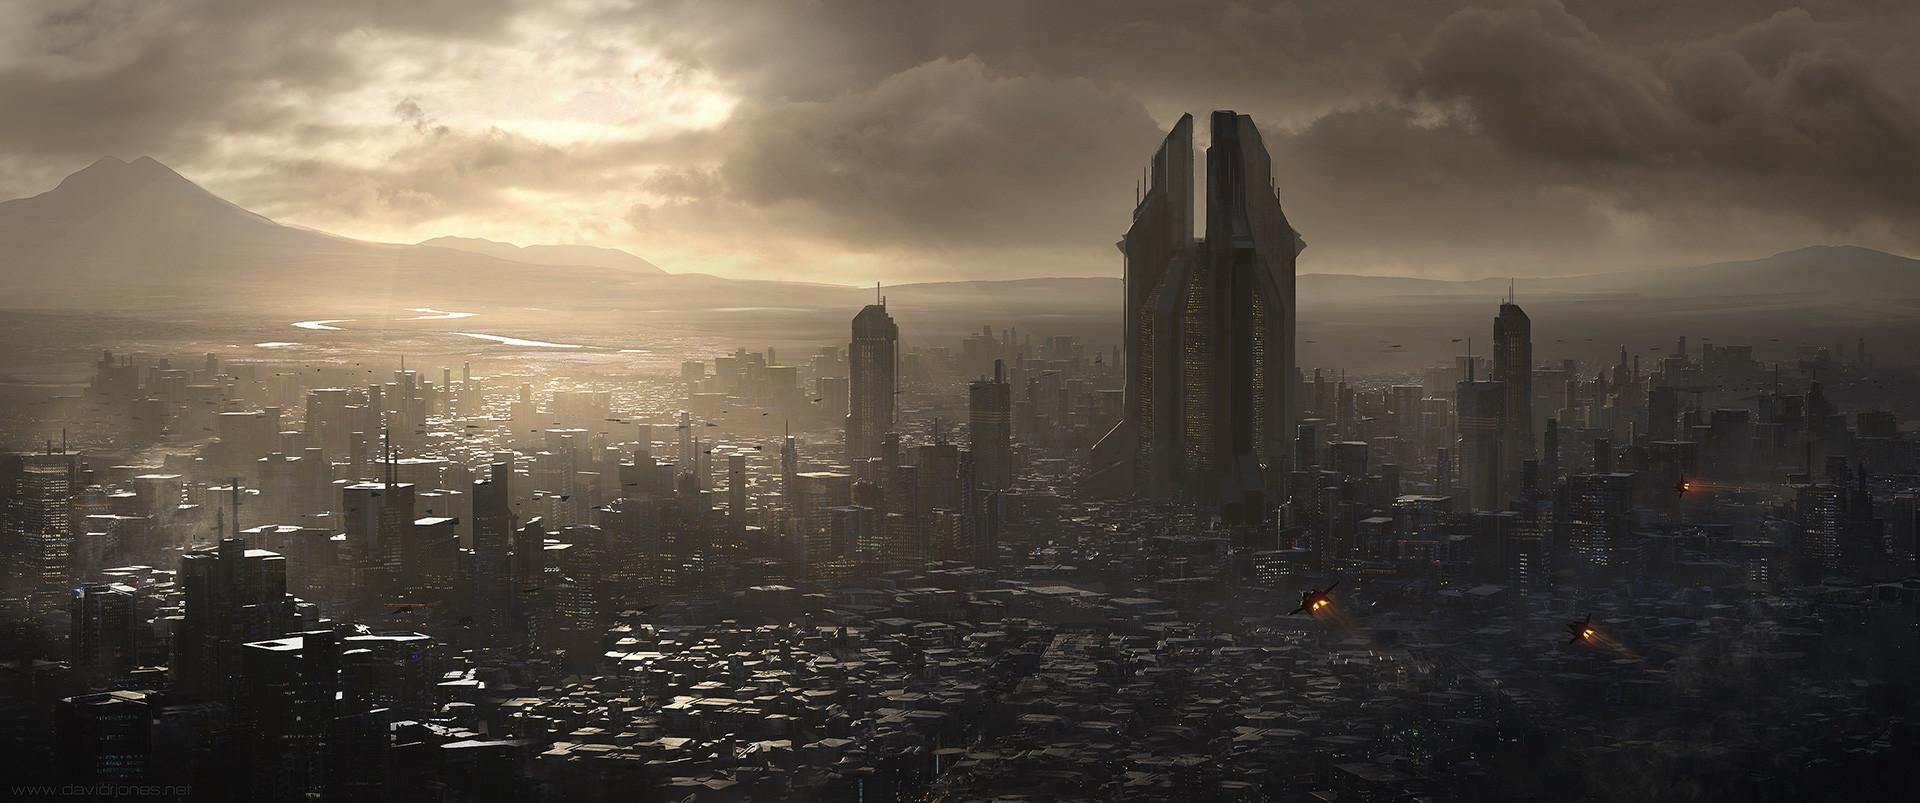 Dave jones foggy city ships 06